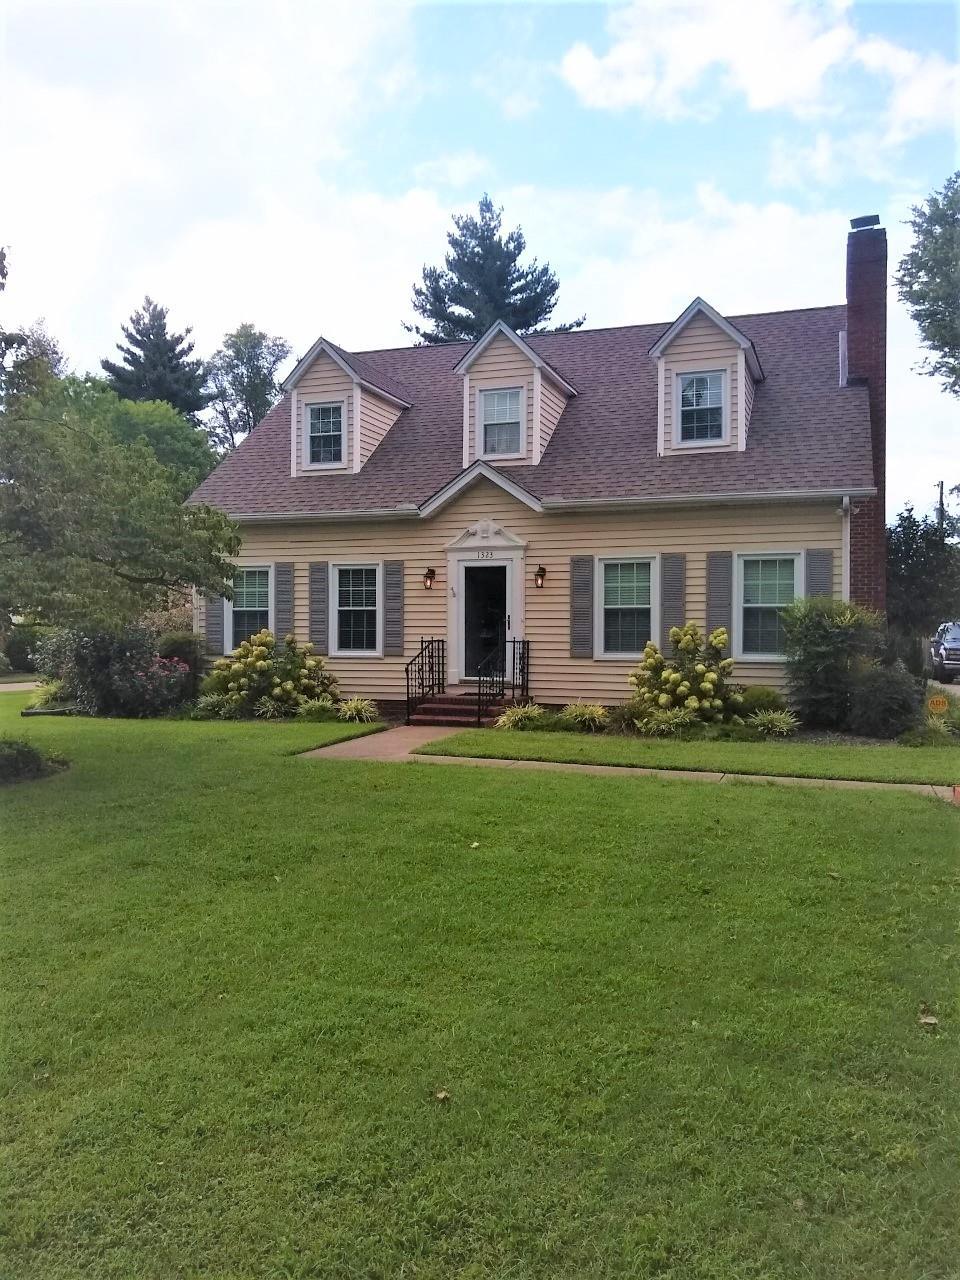 1323 Richland Pl, Murfreesboro, TN 37130 - Murfreesboro, TN real estate listing